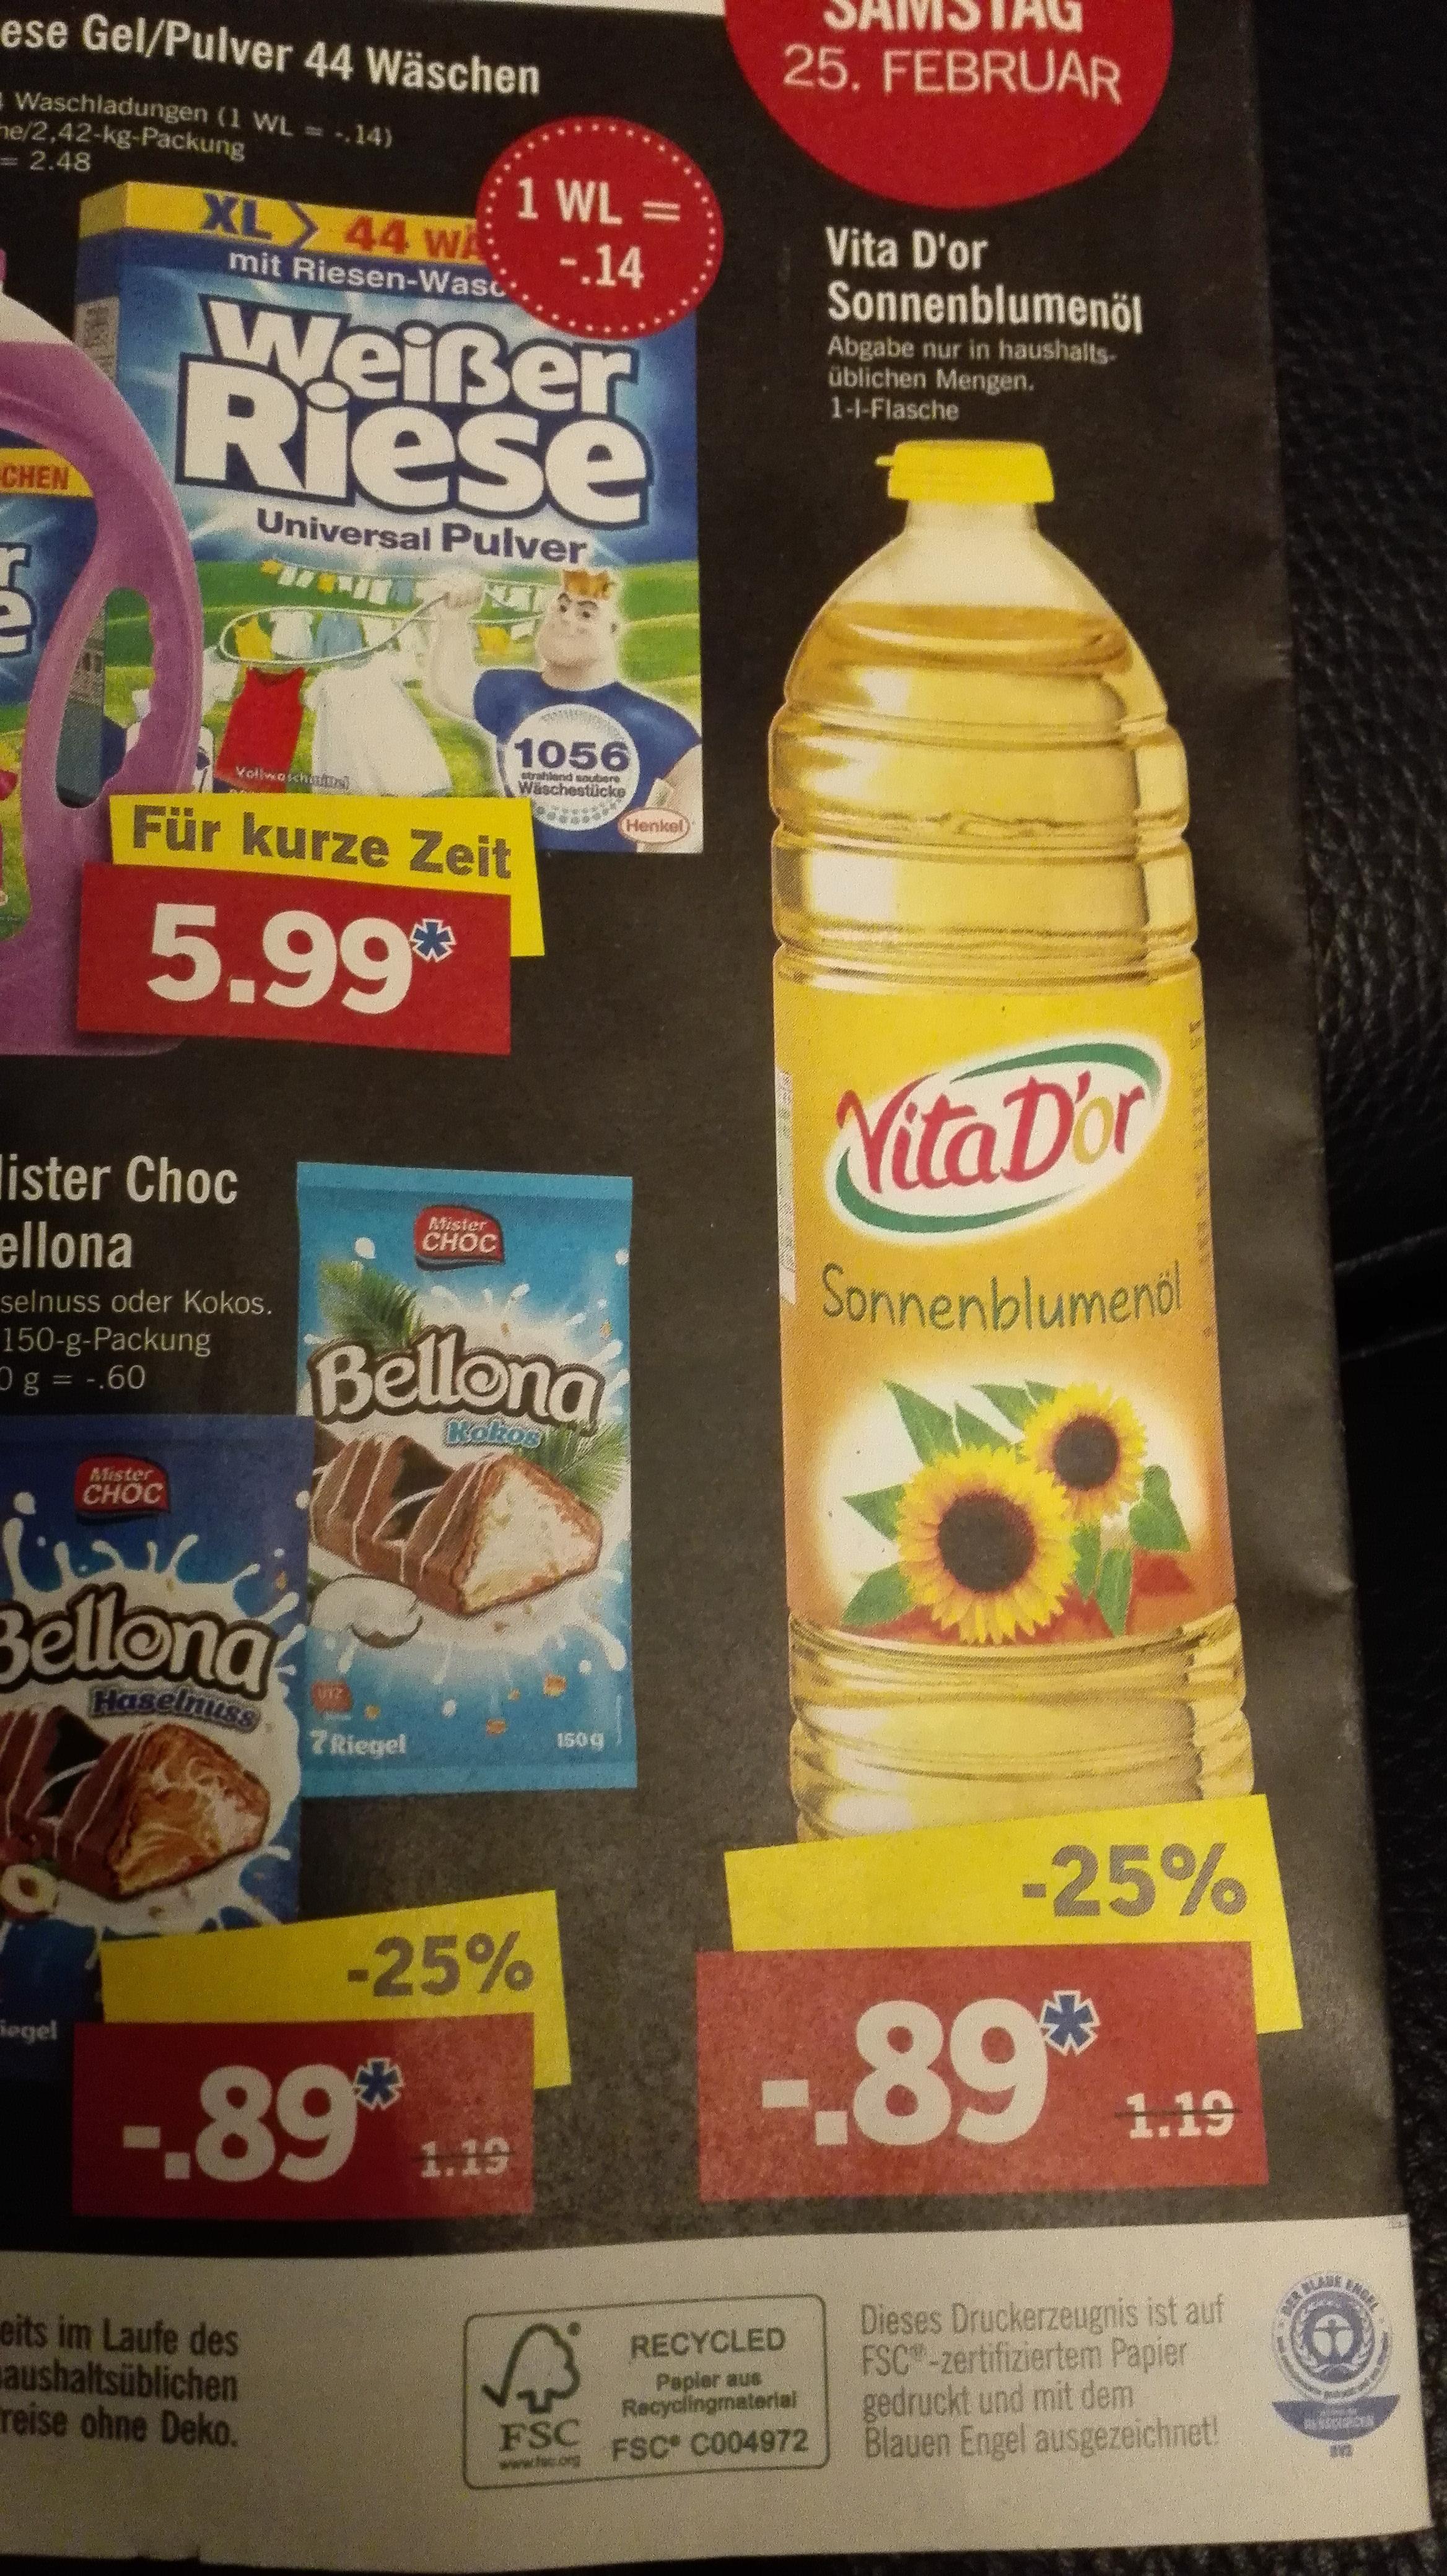 [LIDL] Vita D`or Sonnenblumenöl zu 0,89€ je Liter (statt 1,19€) am 25.02.2017